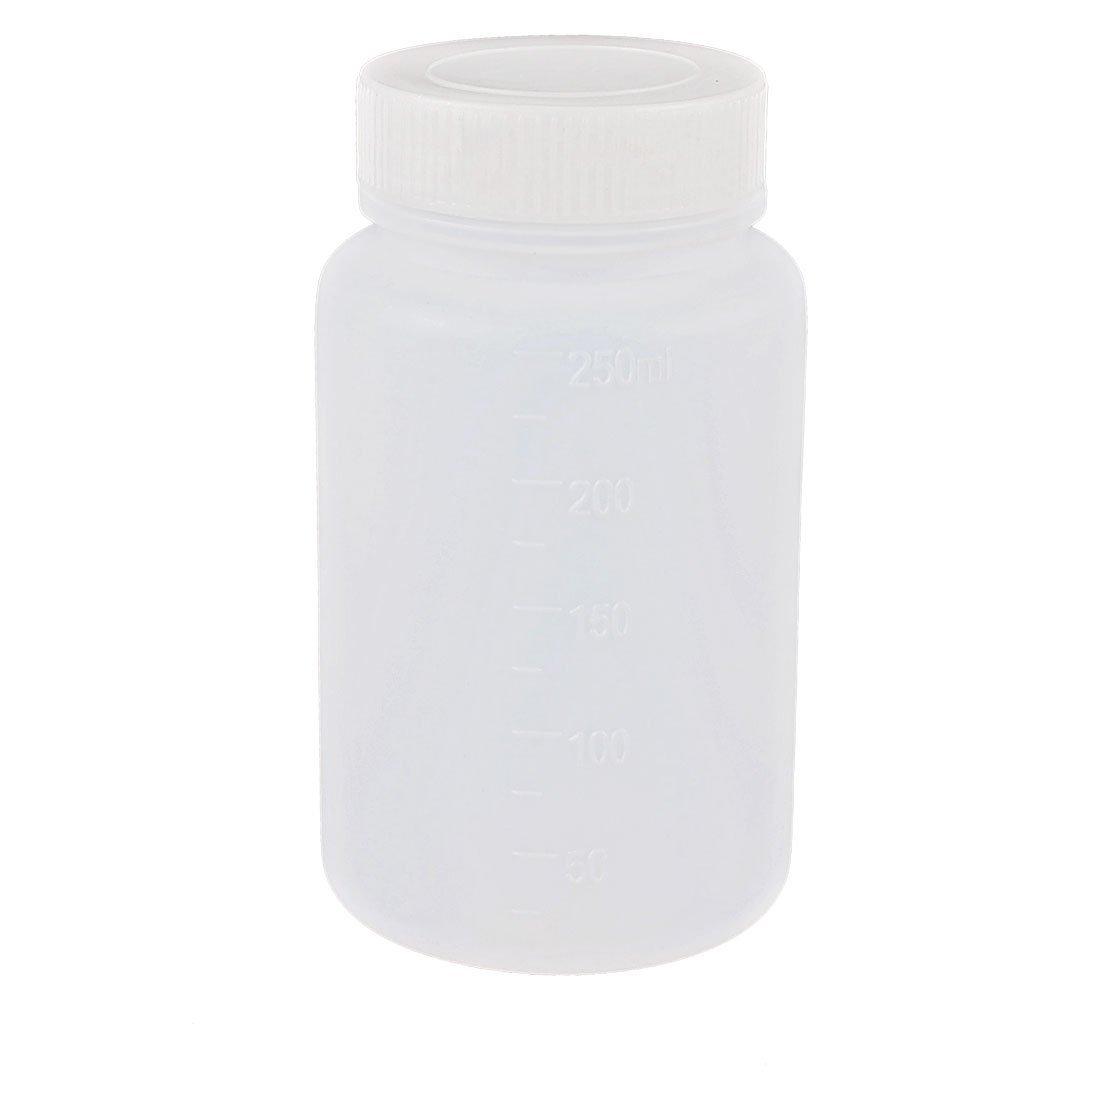 250mL Capacity Laboratory Storage Plastic Widemouth Bottle White a13042200ux0009